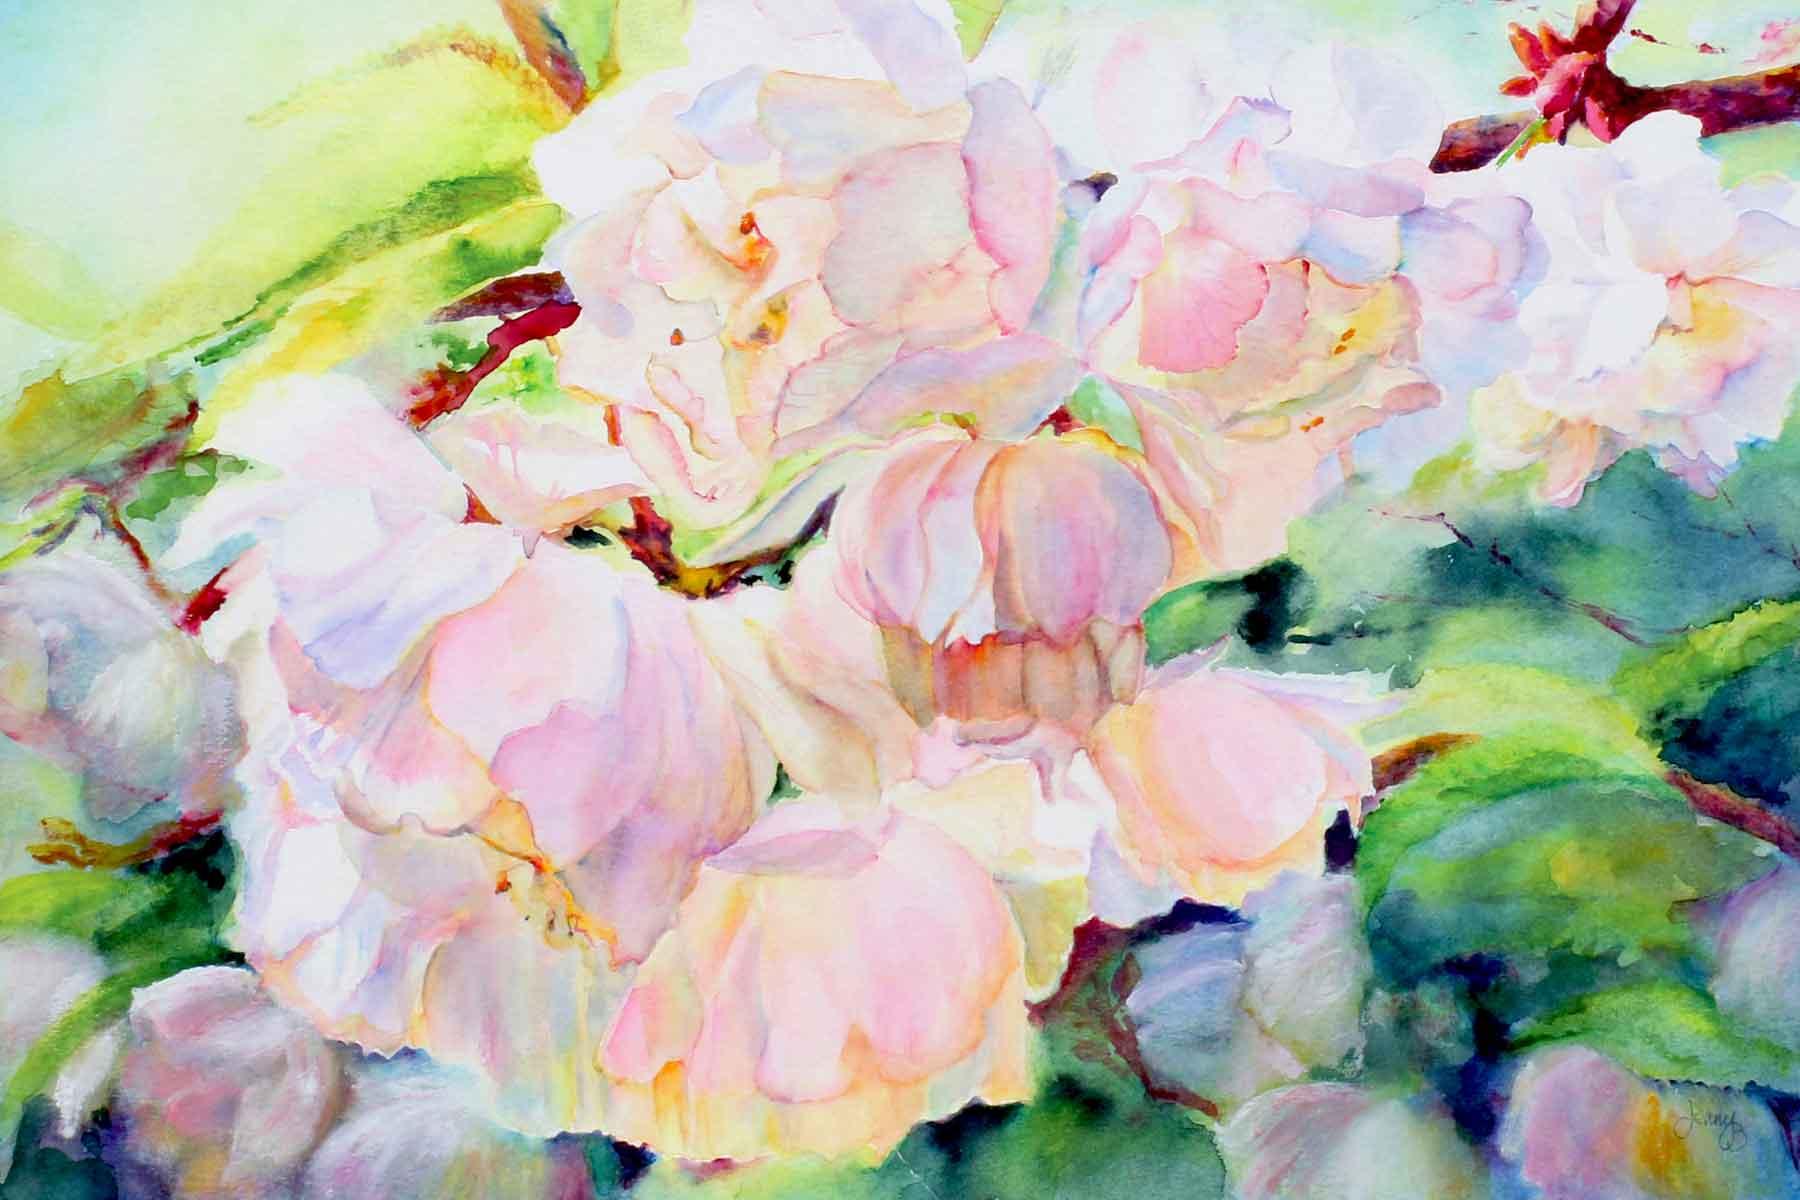 Jenny Brown - Sunlit Cherry Blossom